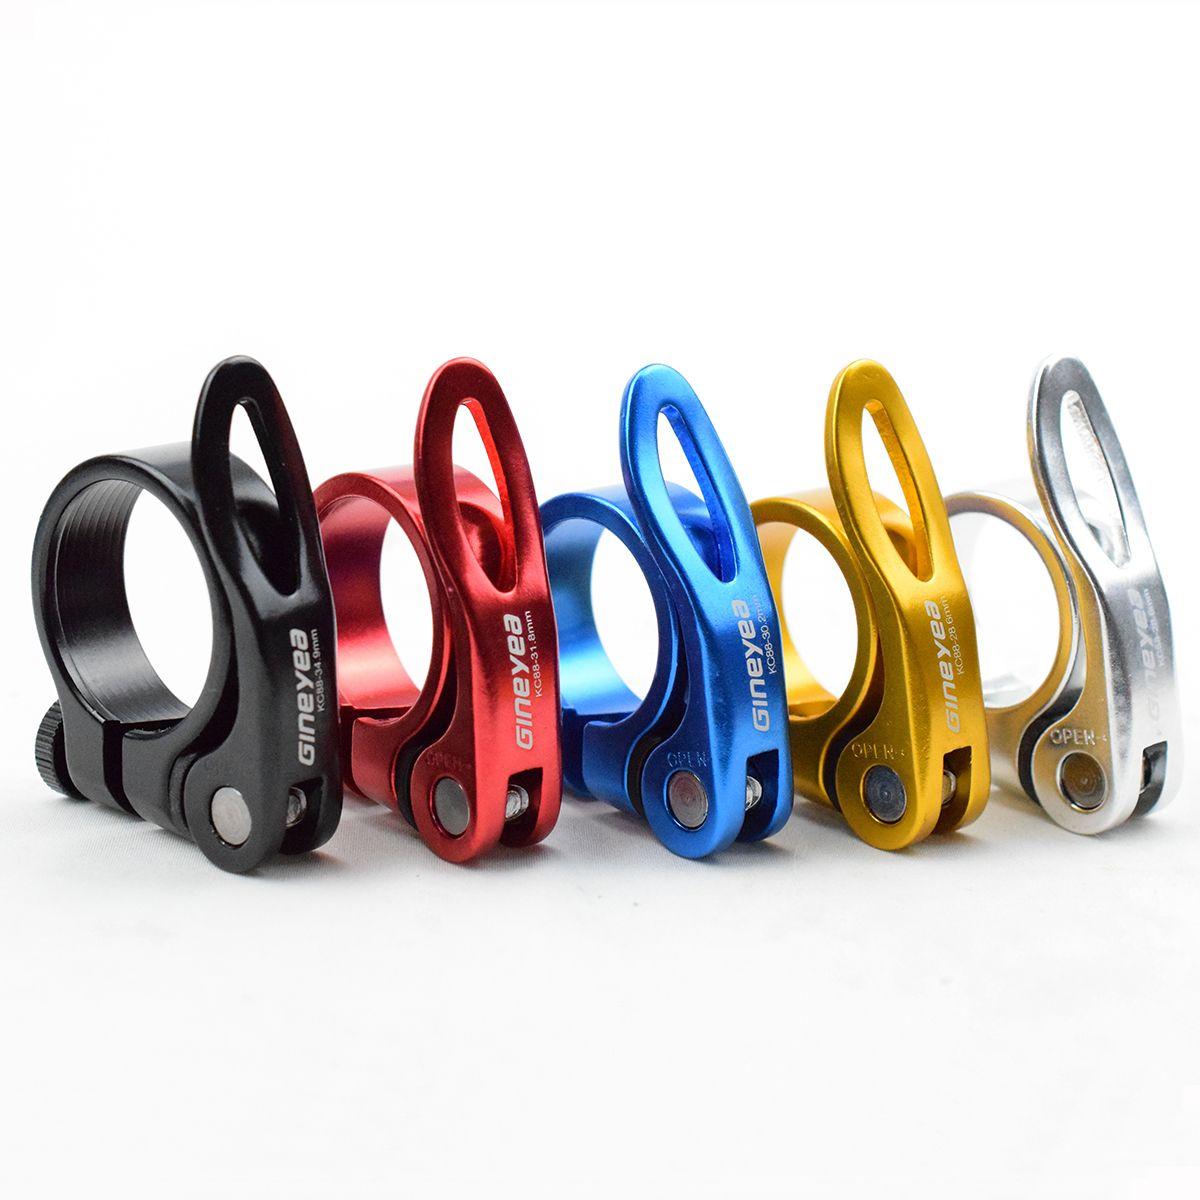 Schnellspanner Sattelklemme Alloy QR-Fahrrad-Sattel Rohrschellen 28,6 / 30,2 / 31,8 / 34,9 mm Straße MTB Fahrrad Sattleklemme